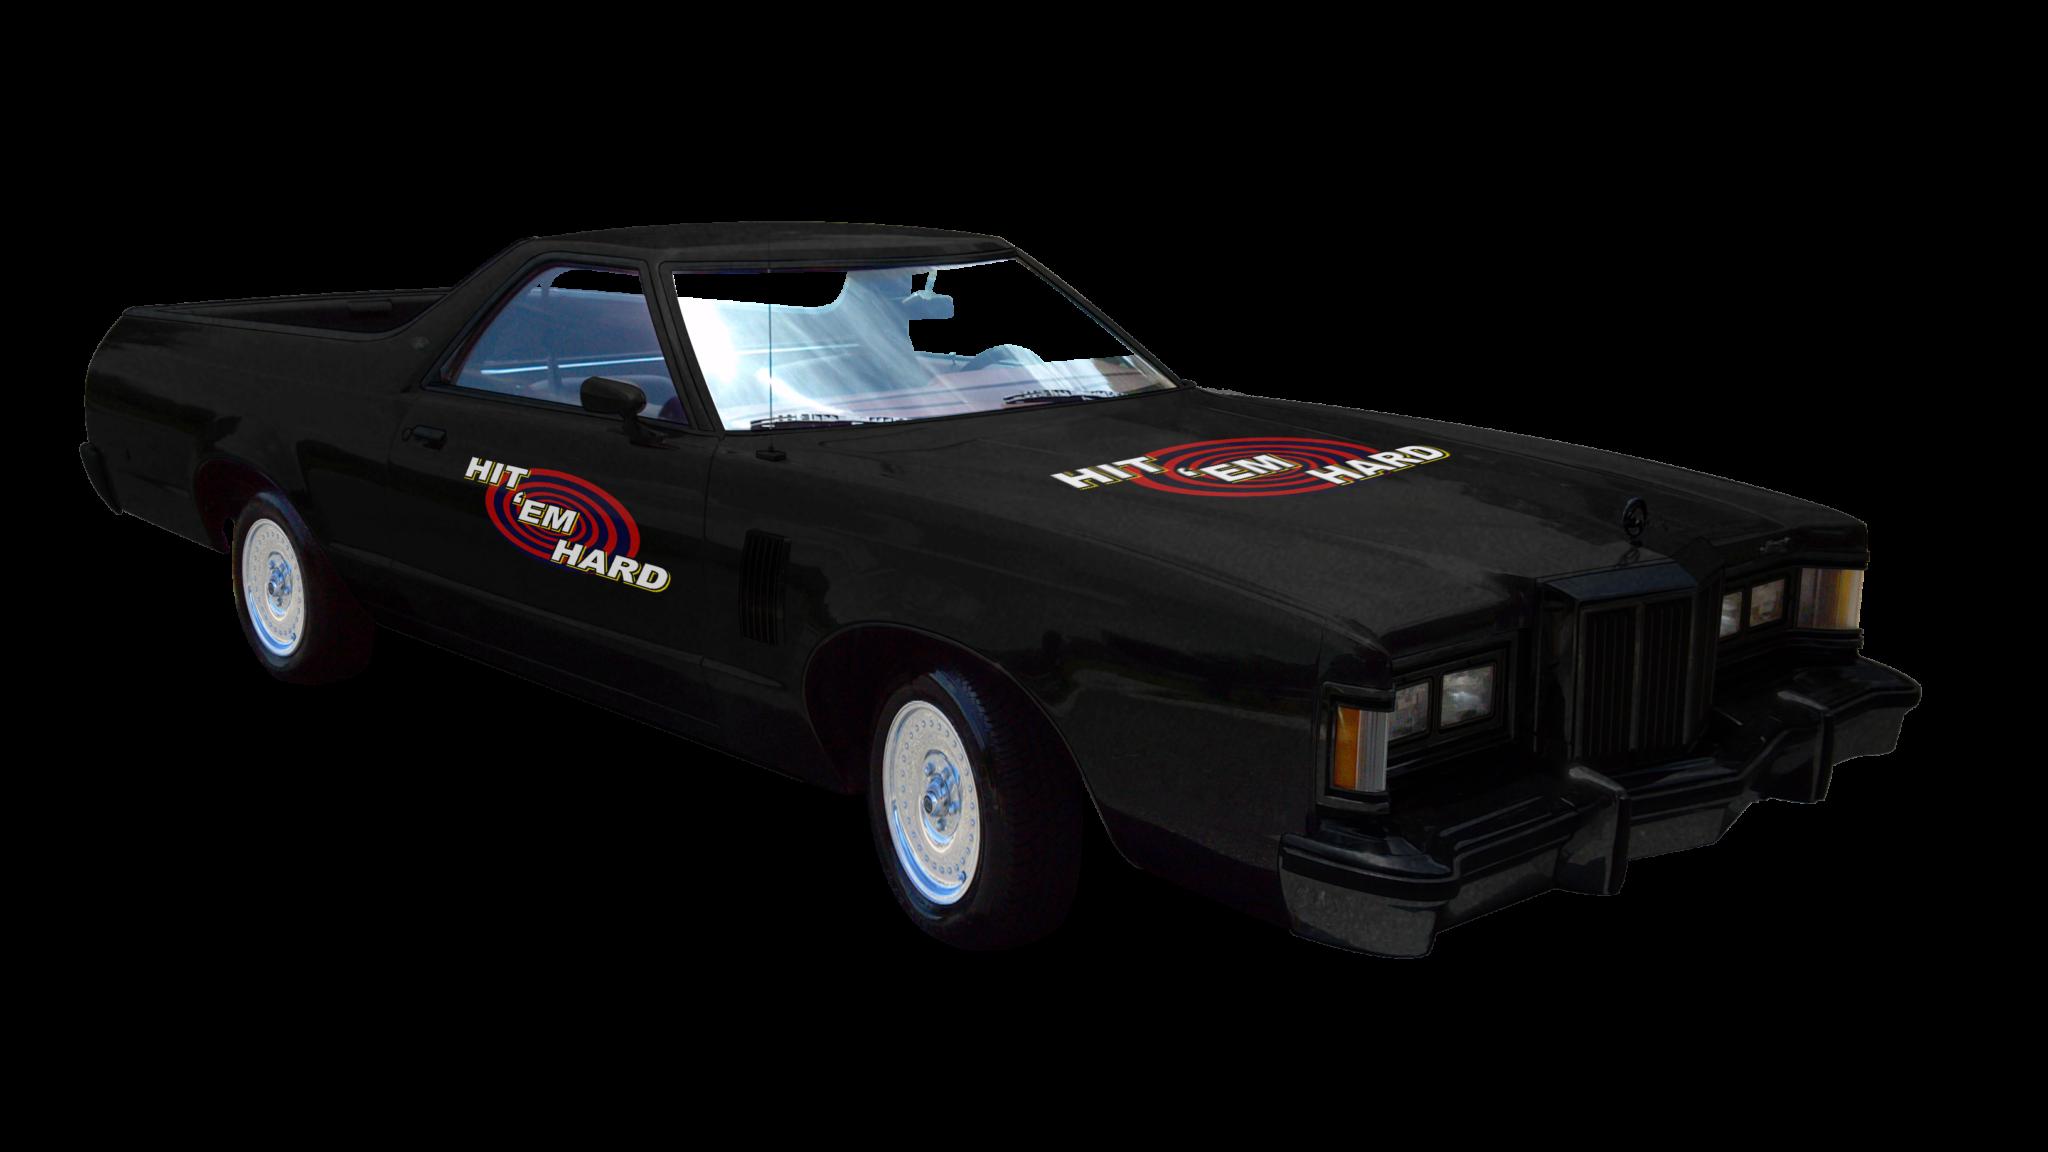 Matte Black Car Photo editing